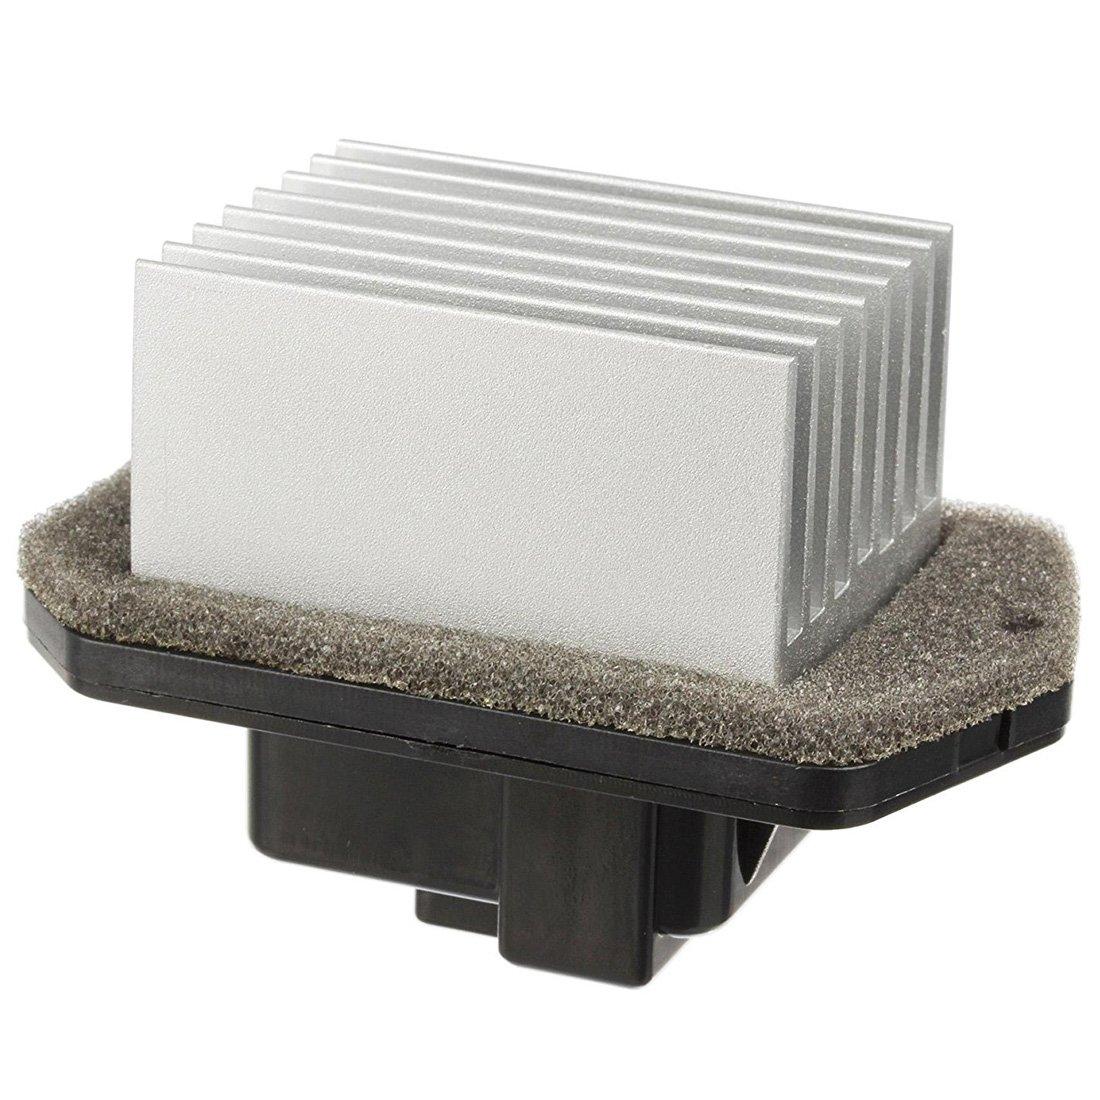 FAERSI HVAC Fan Blower Motor Resistor for 2004-2006 Acura TSX 2003-2005 Honda Accord 4 Door Sedan 2006-2007 Honda Civic Replace OE# RU-398 79330SDRA0 79330SDAA01